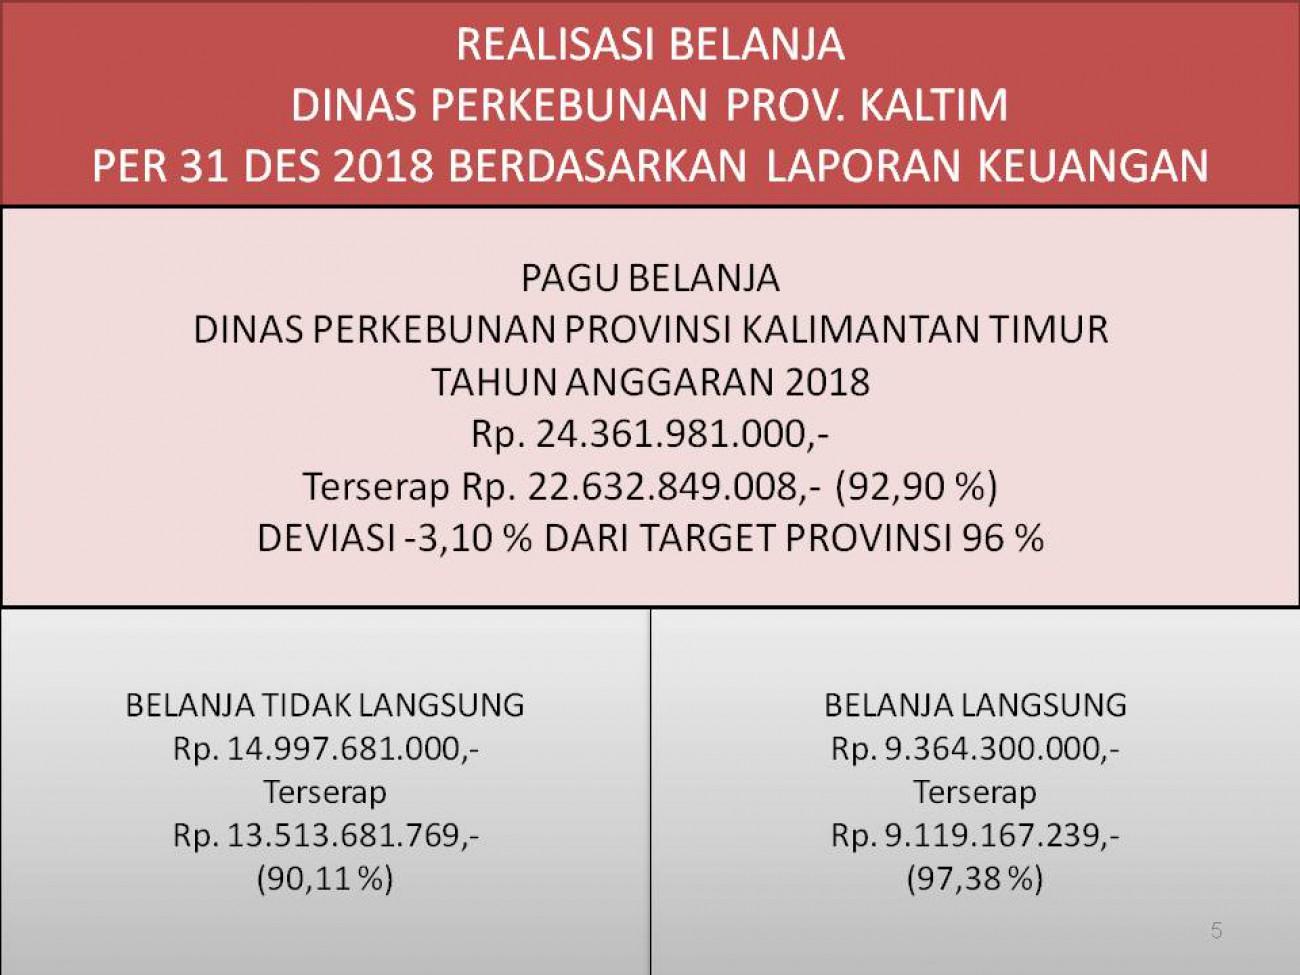 Laporan Realisasi APBD Dinas Perkebunan Prov. Kaltim Bulan Desember 2018